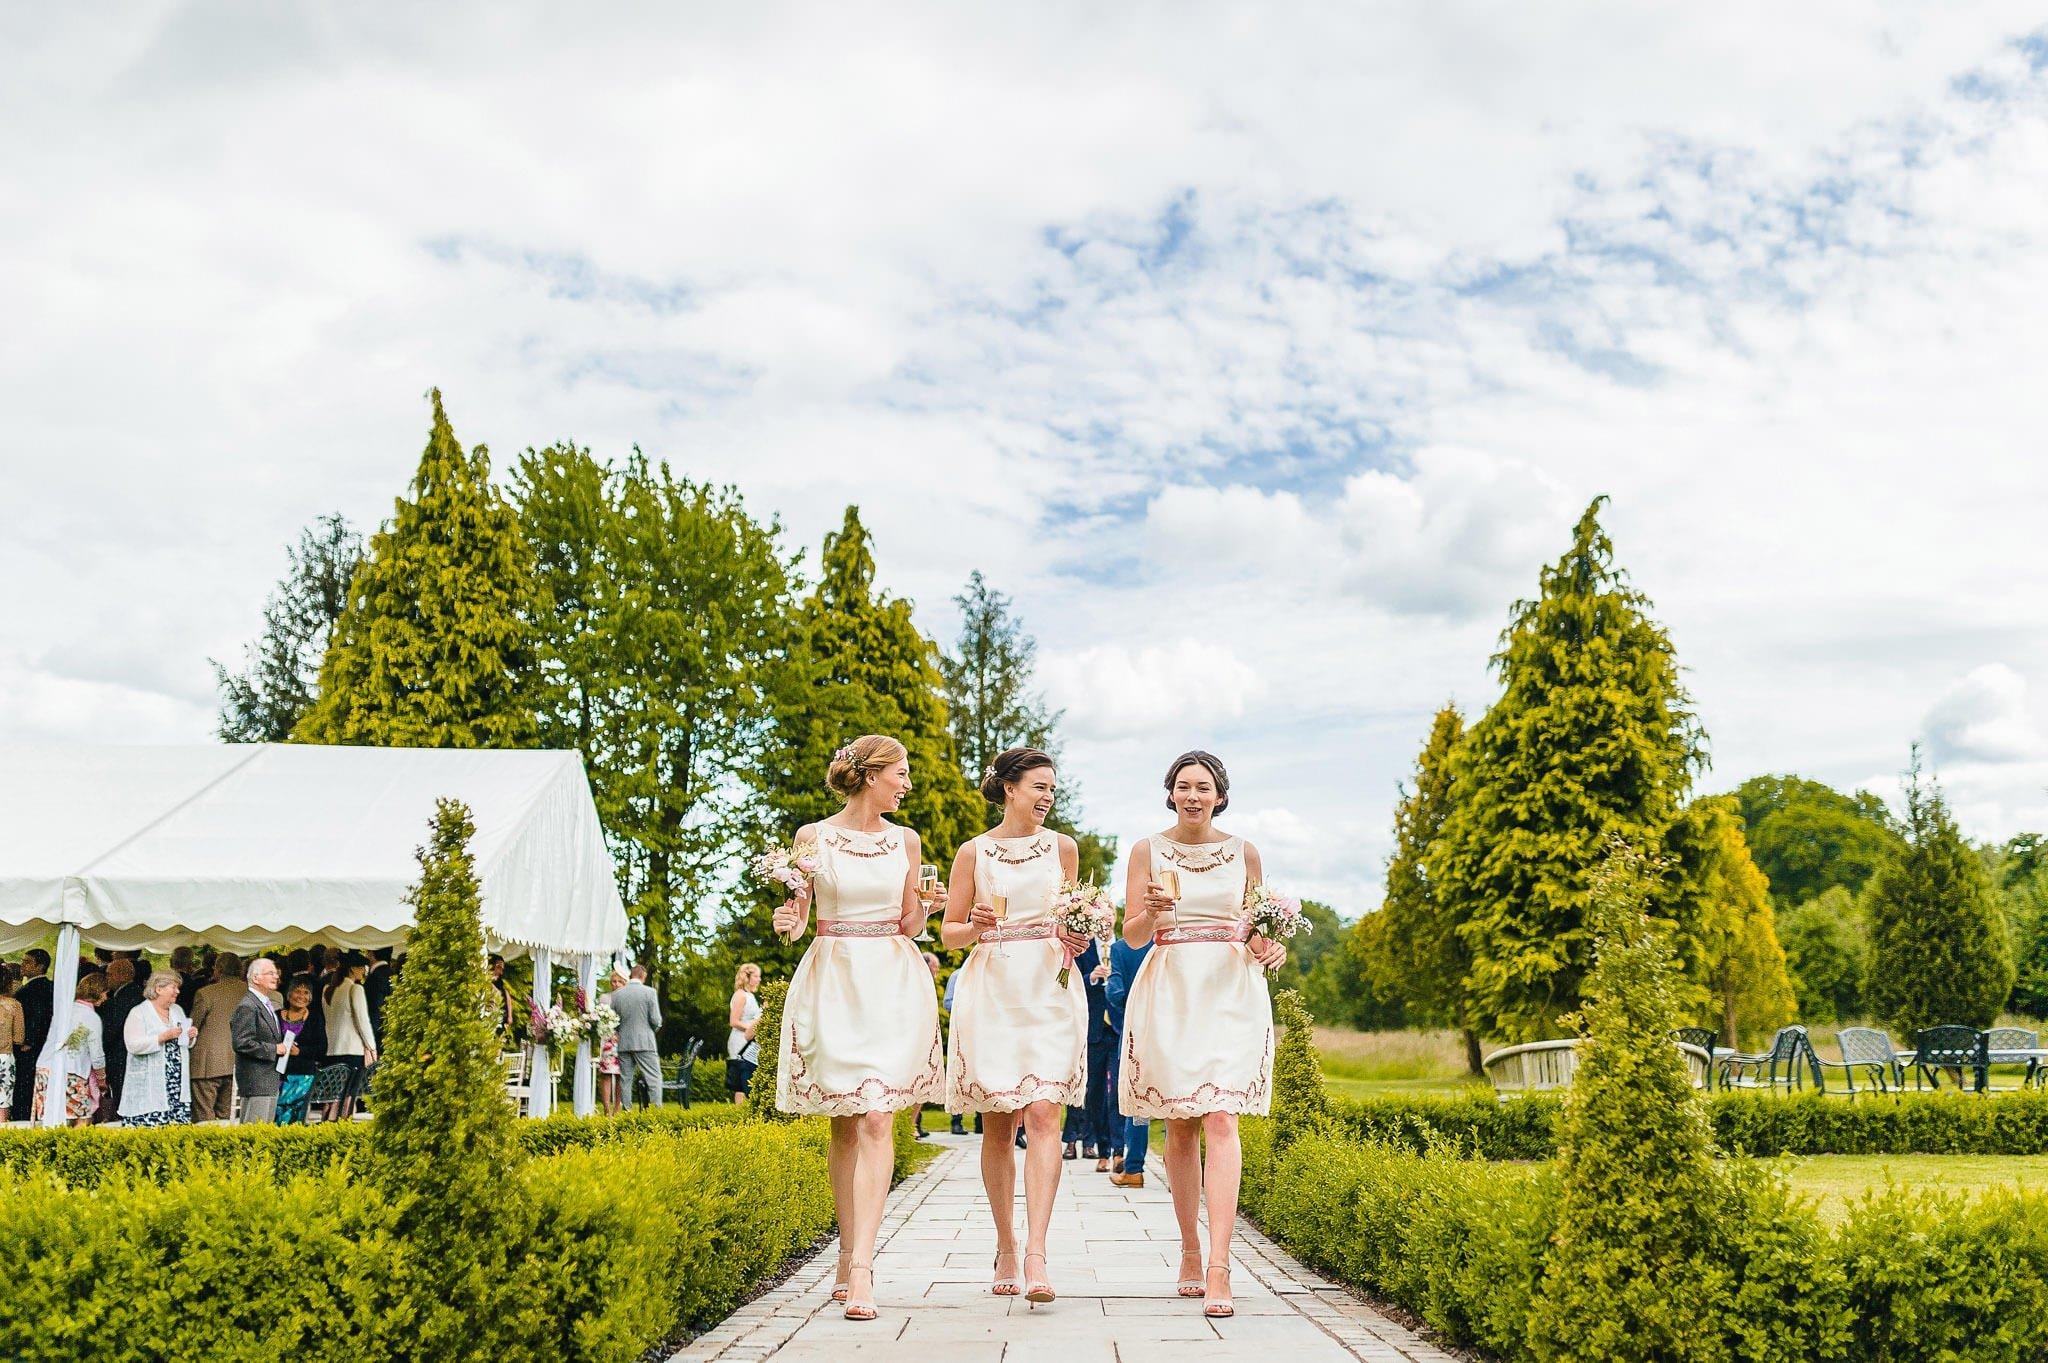 Lemore Manor Wedding Photographer | Hannah and Angus 32